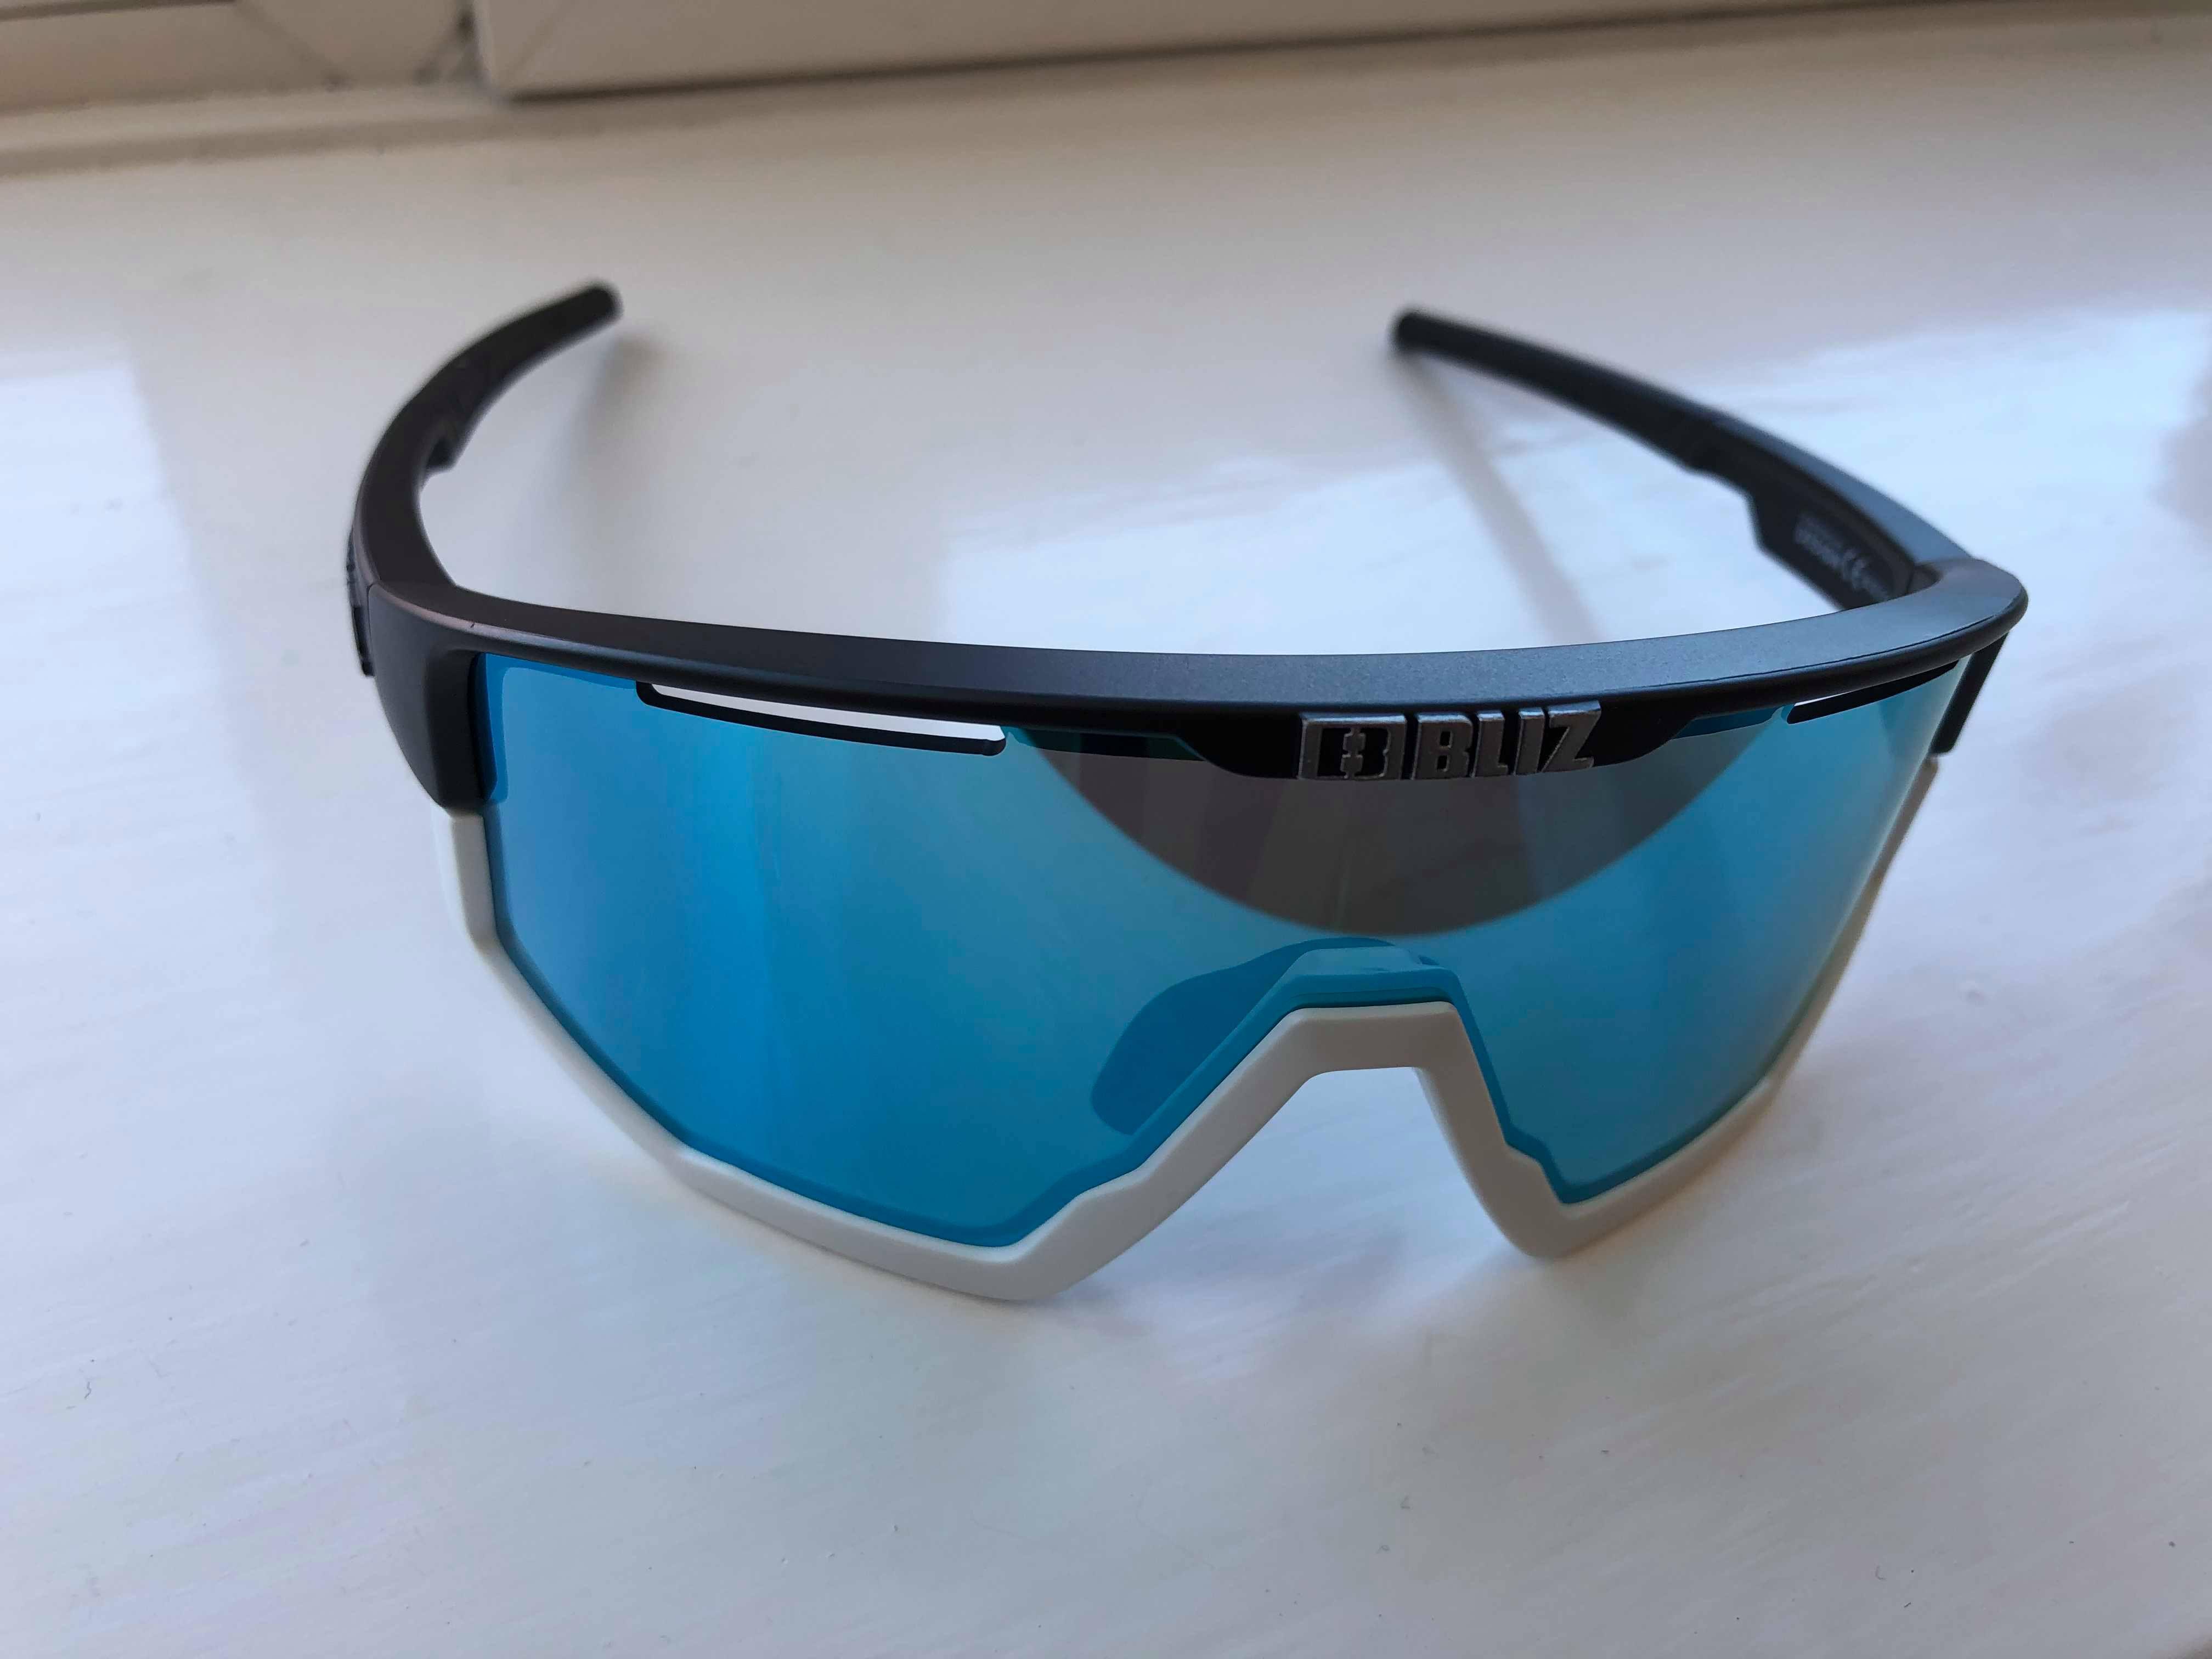 Test: Bliz Fusion cykelbriller | CykelStart.dk